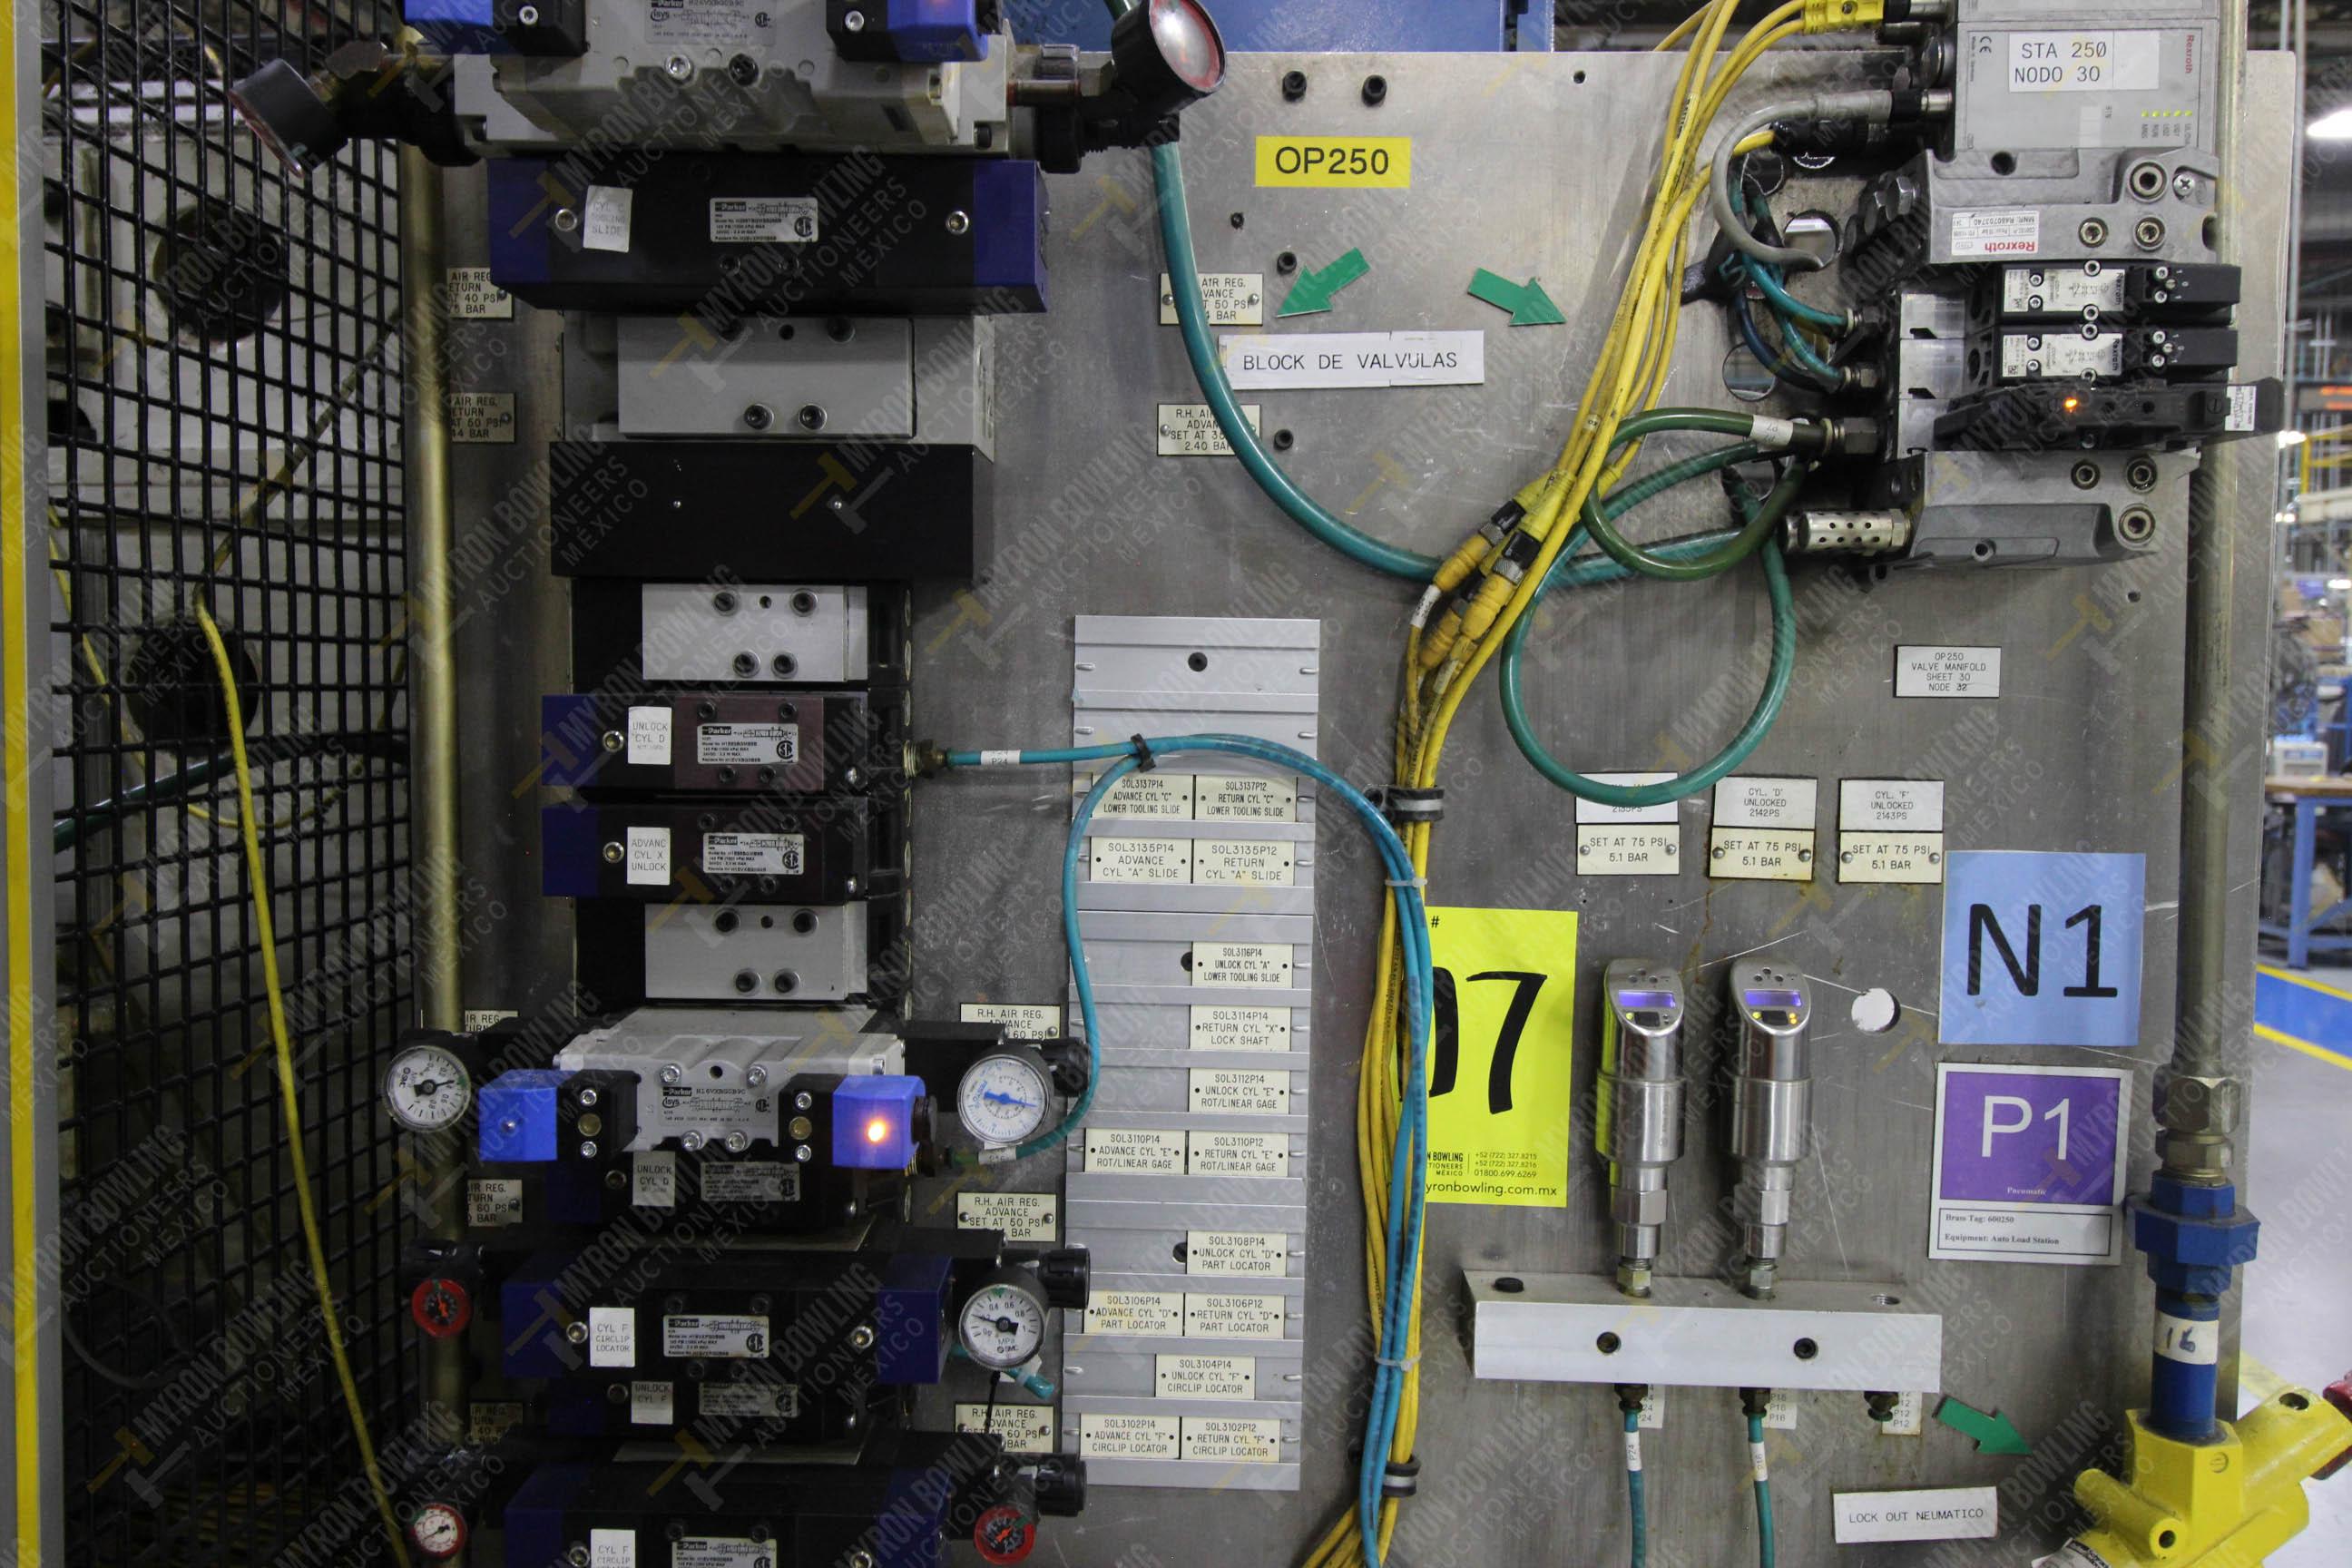 Estación semiautomática para operación 250 de ensamble de candado, contiene - Image 14 of 21